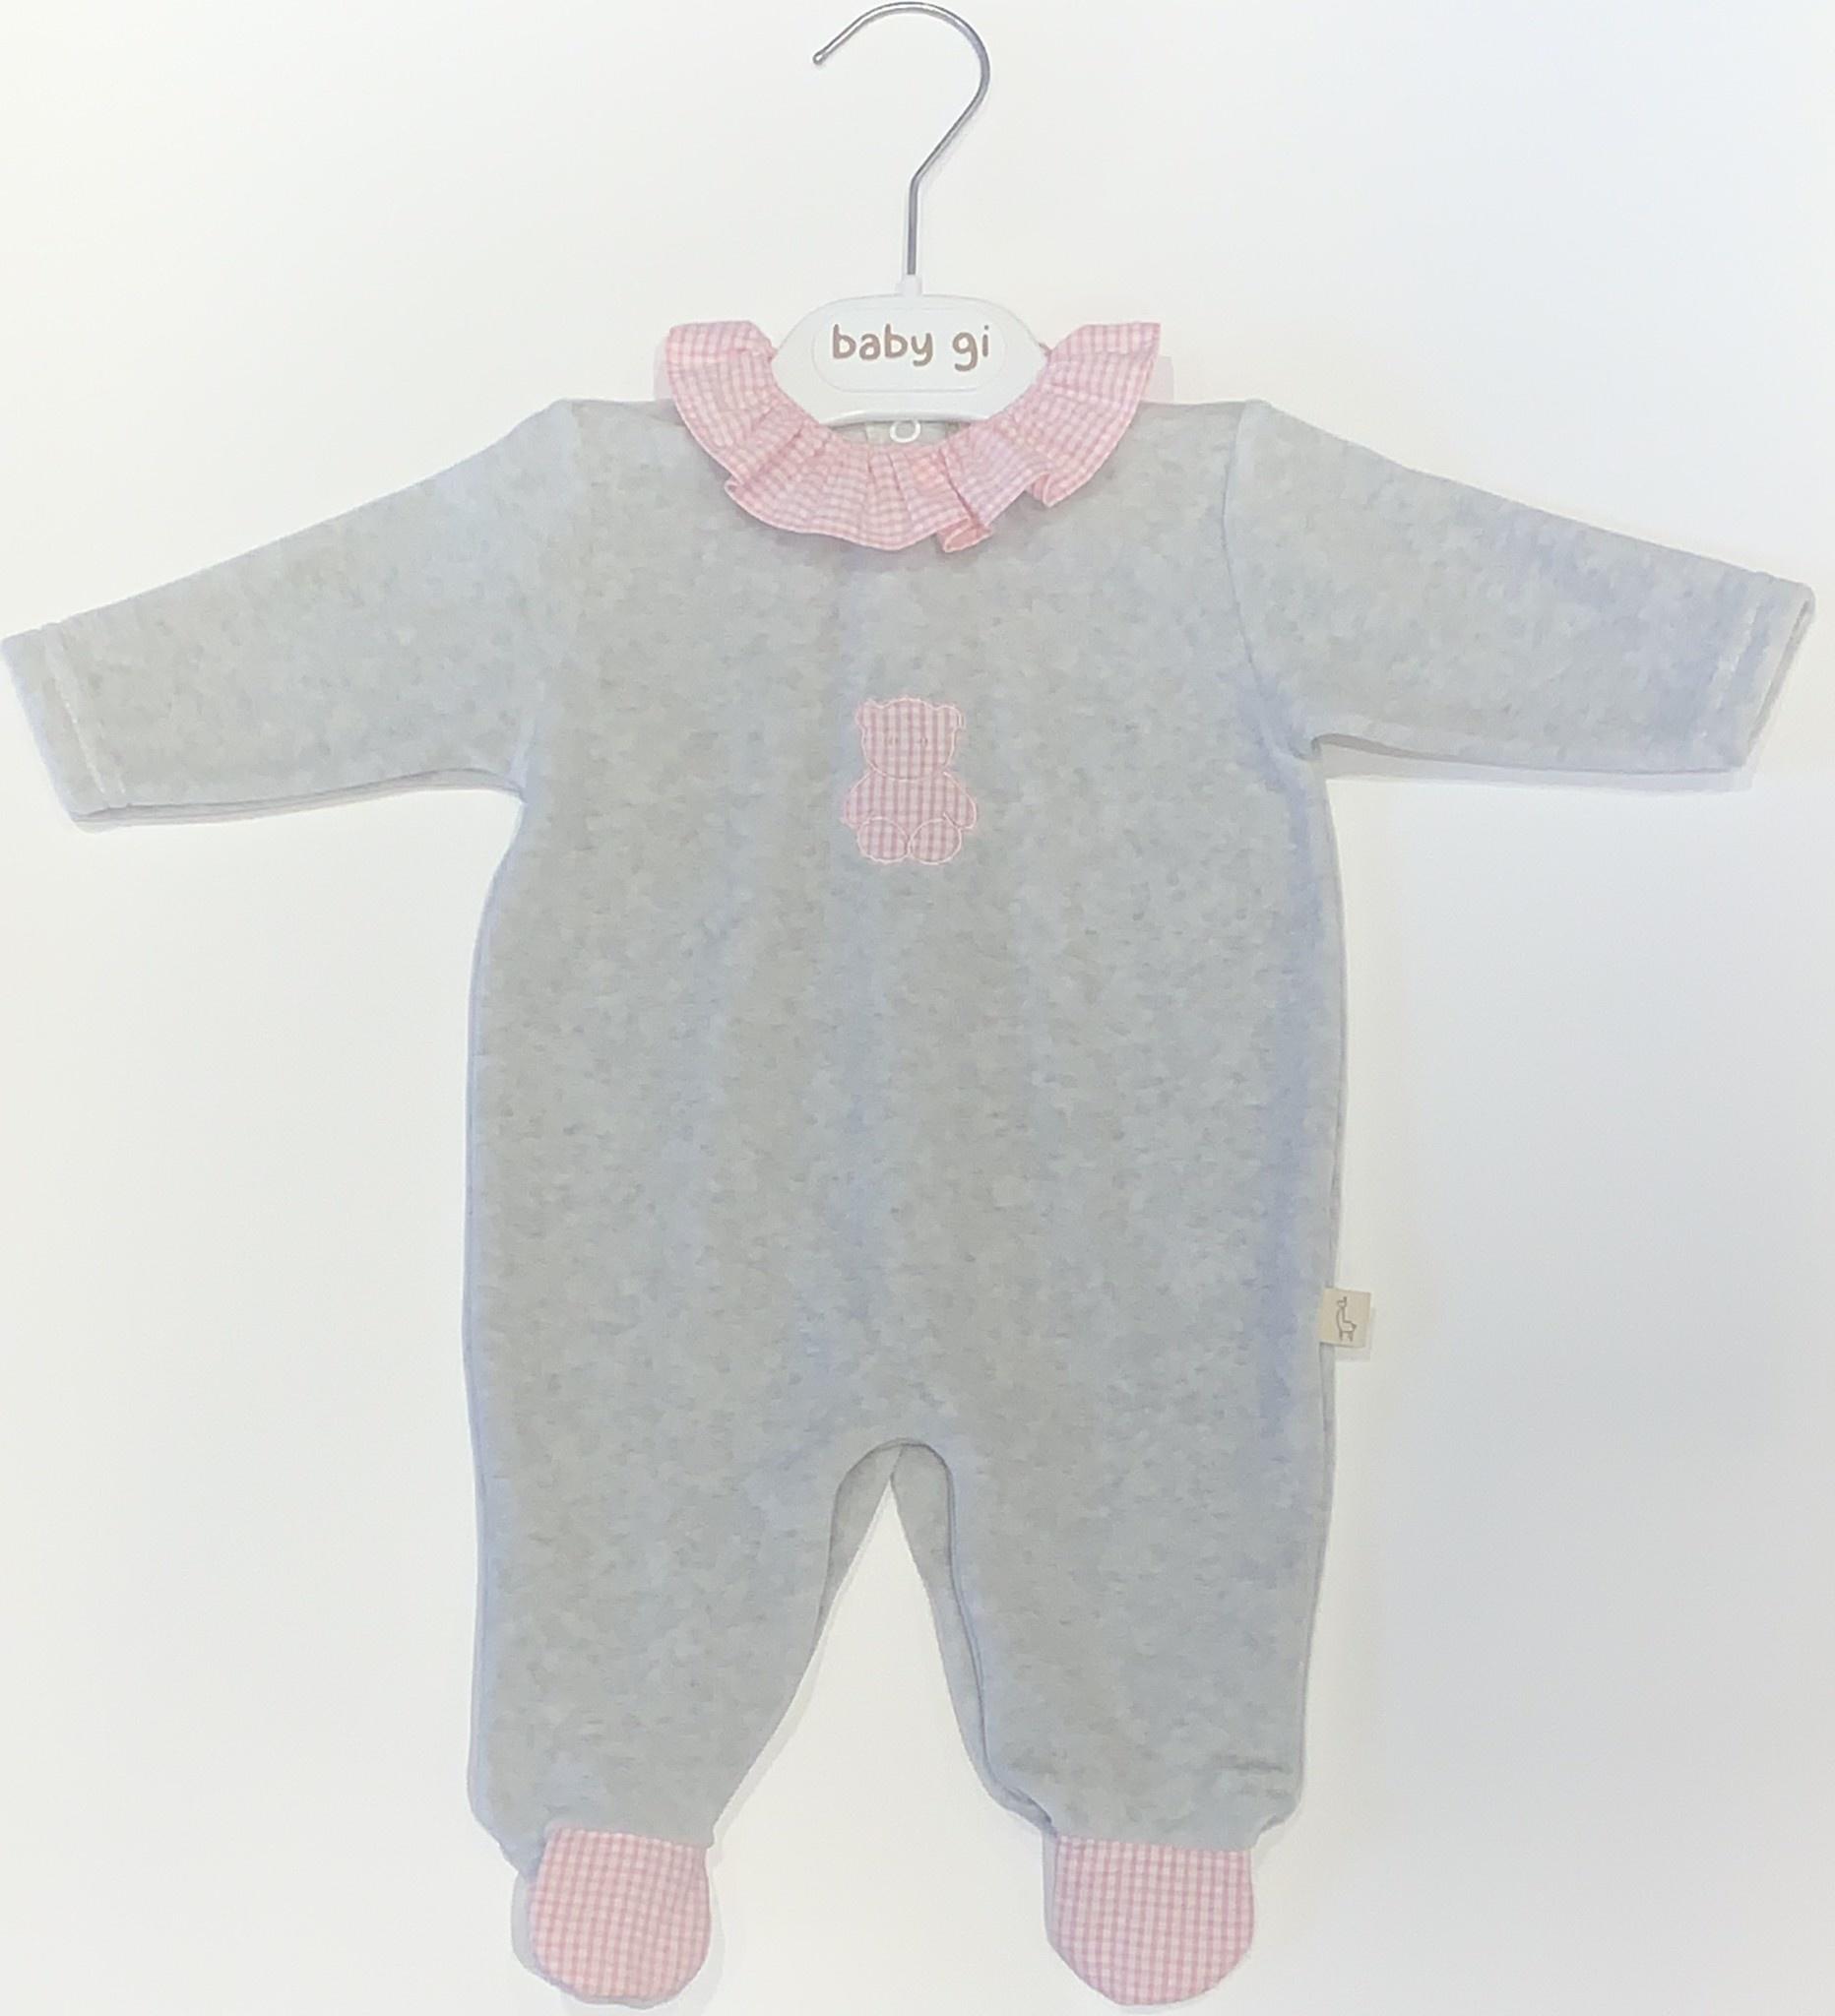 Baby Gi Baby Gi grey and pink teddy baby grow with gingham detail